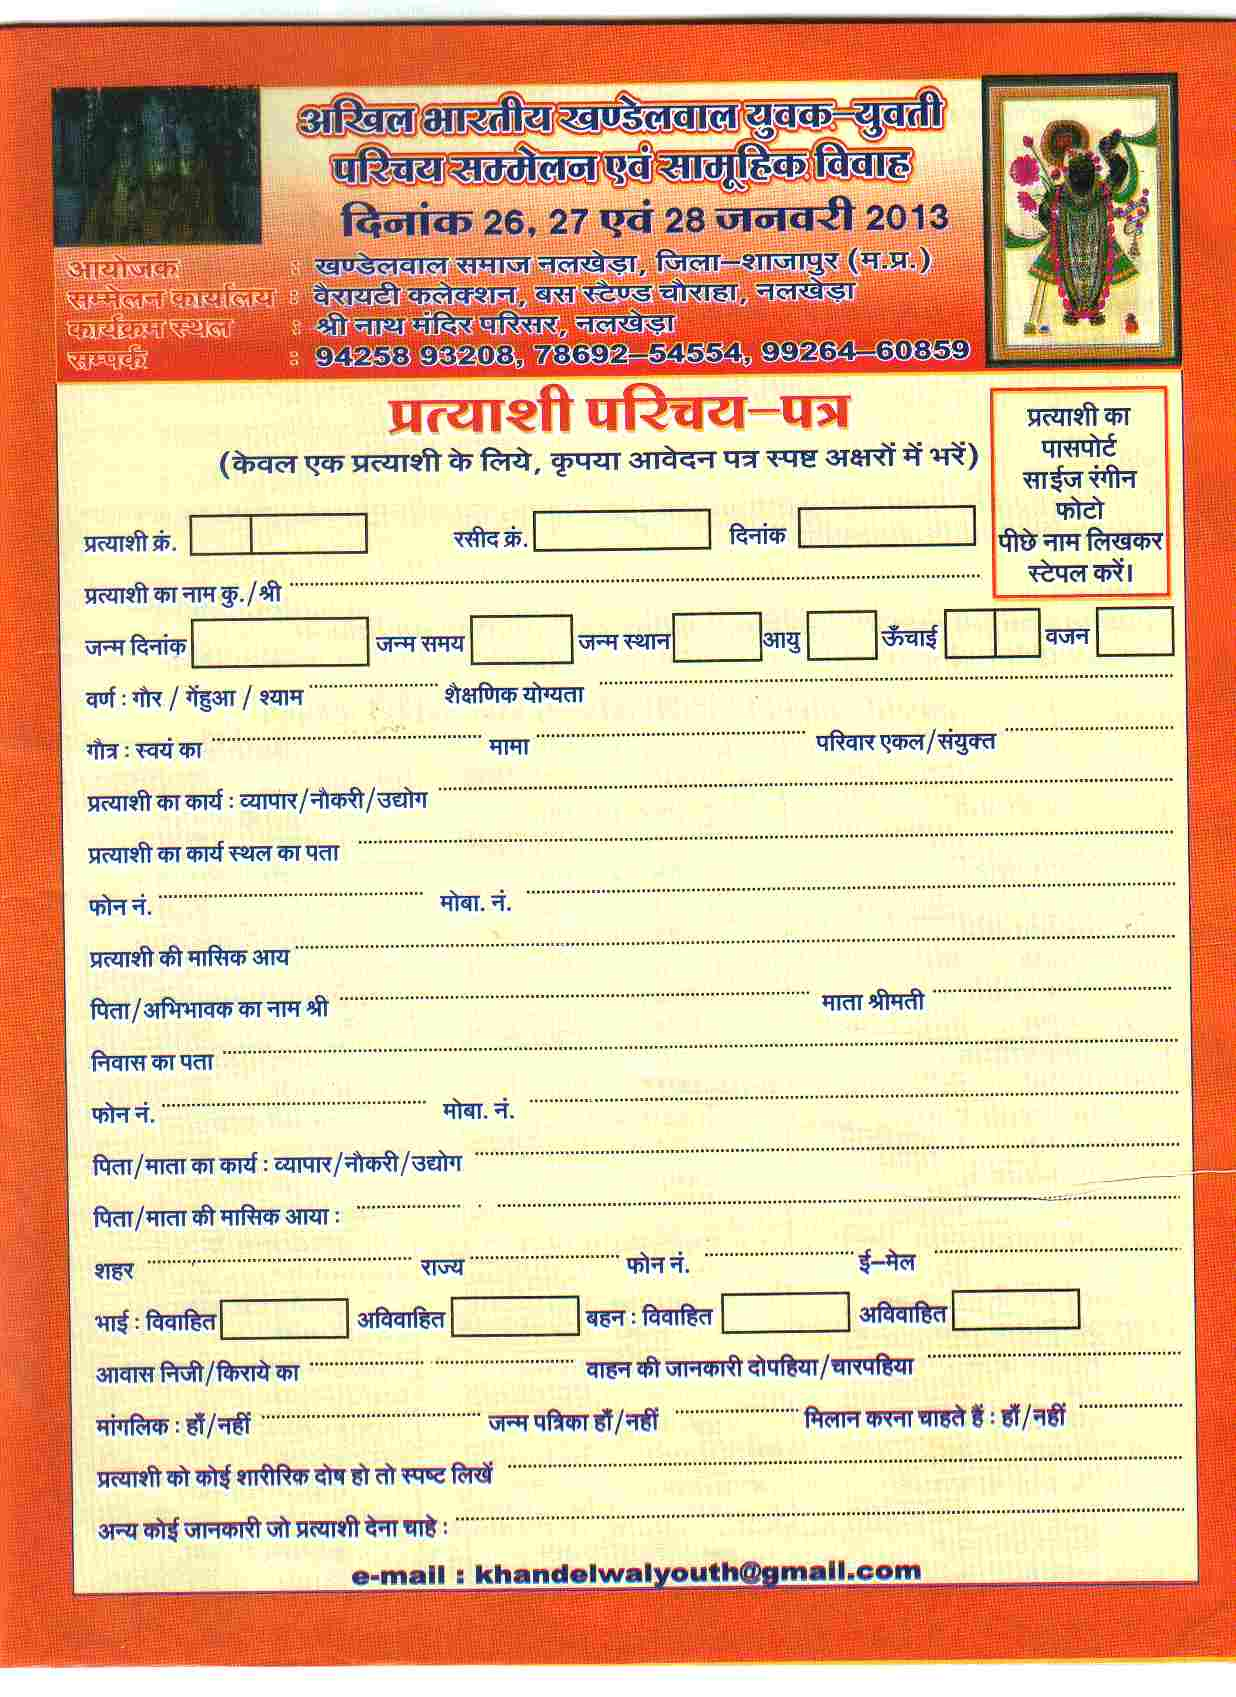 Khandelwal Samaj Parichay Sammelan, Nalkheda: Forms